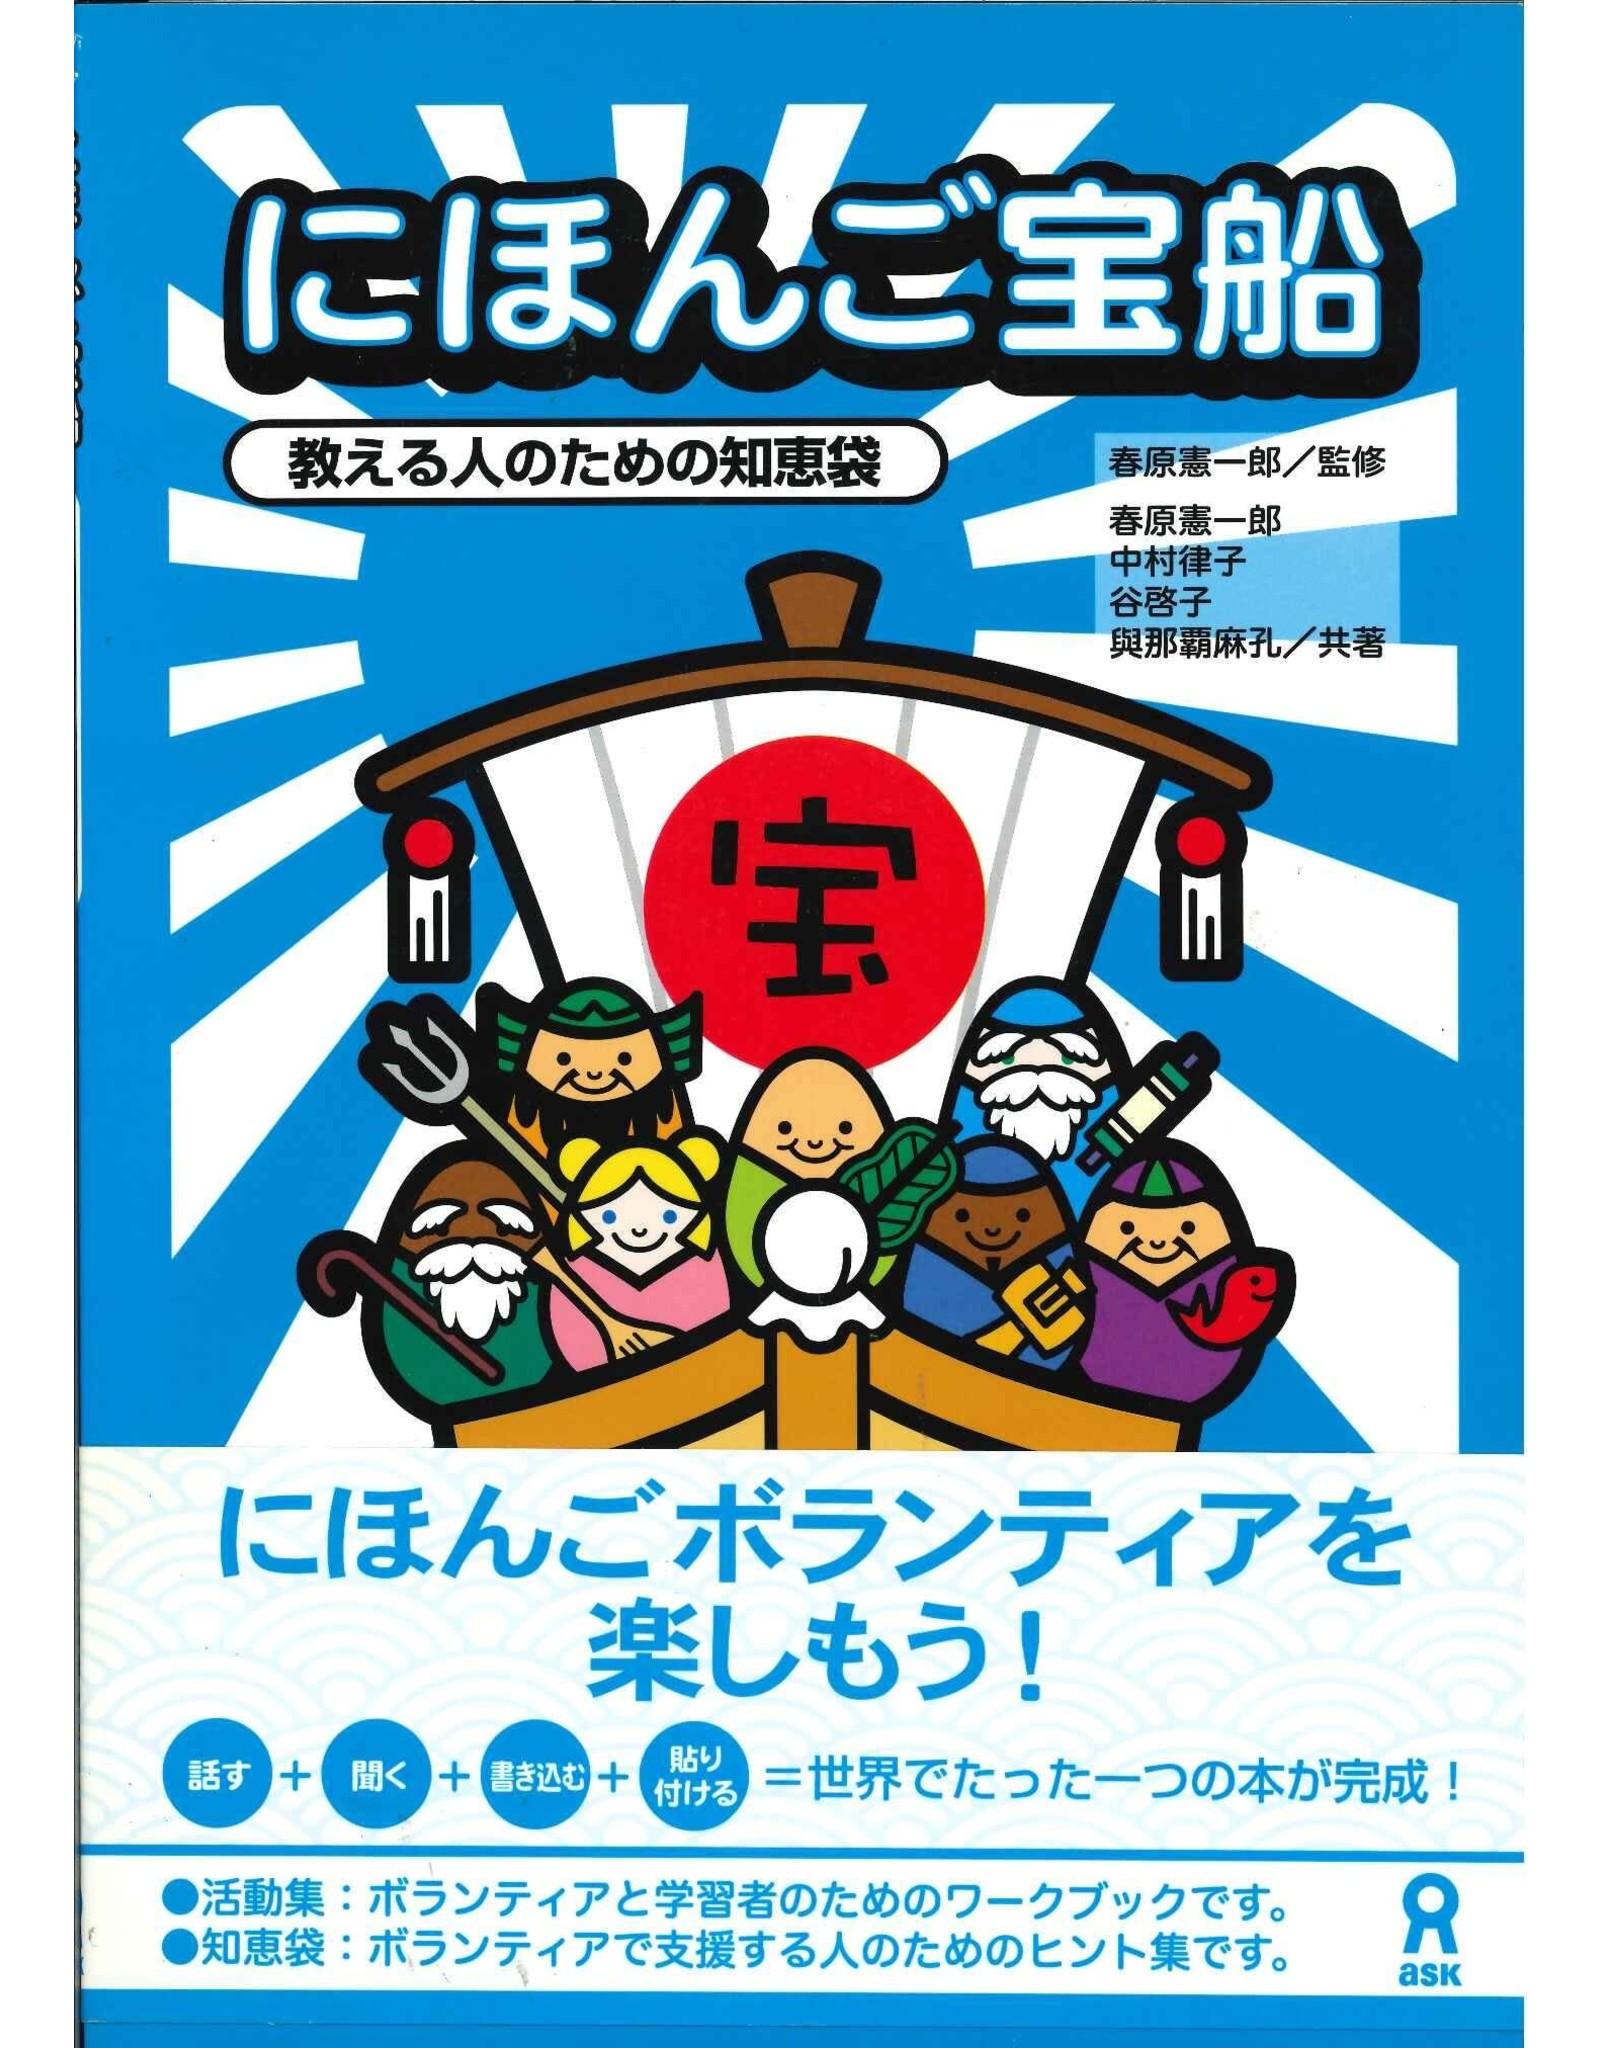 ASK NIHONGO TAKARABUNE - CHIEBUKURO